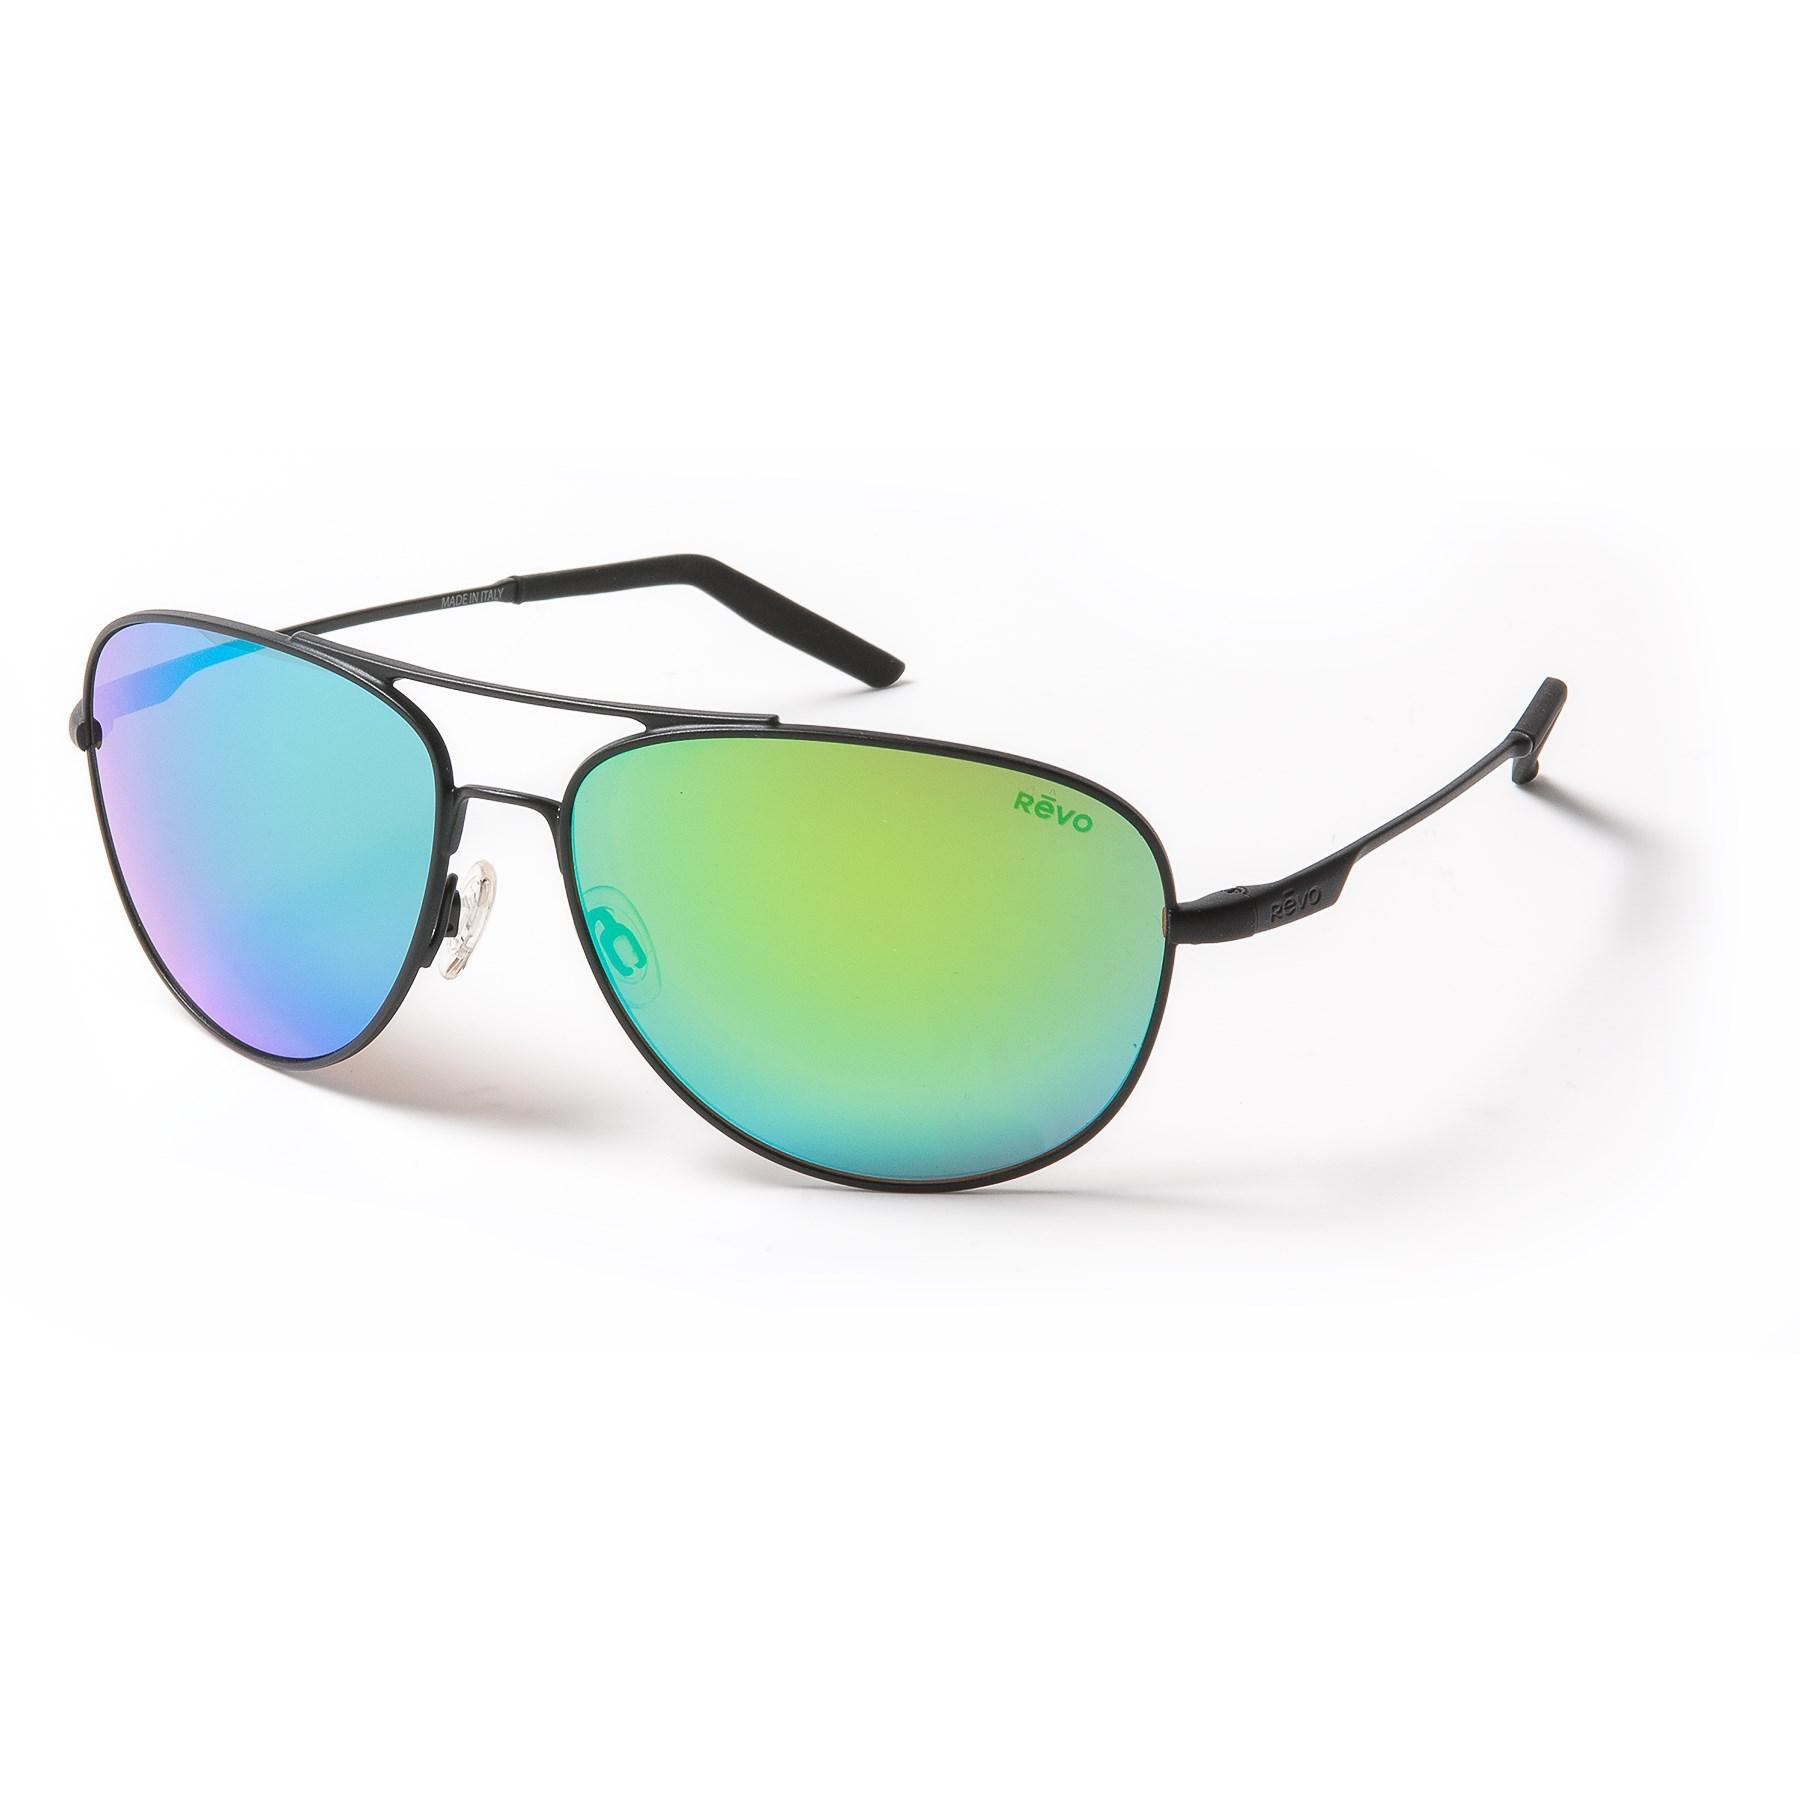 617bd2f76f Lyst - Revo Windspeed Sunglasses in Green for Men